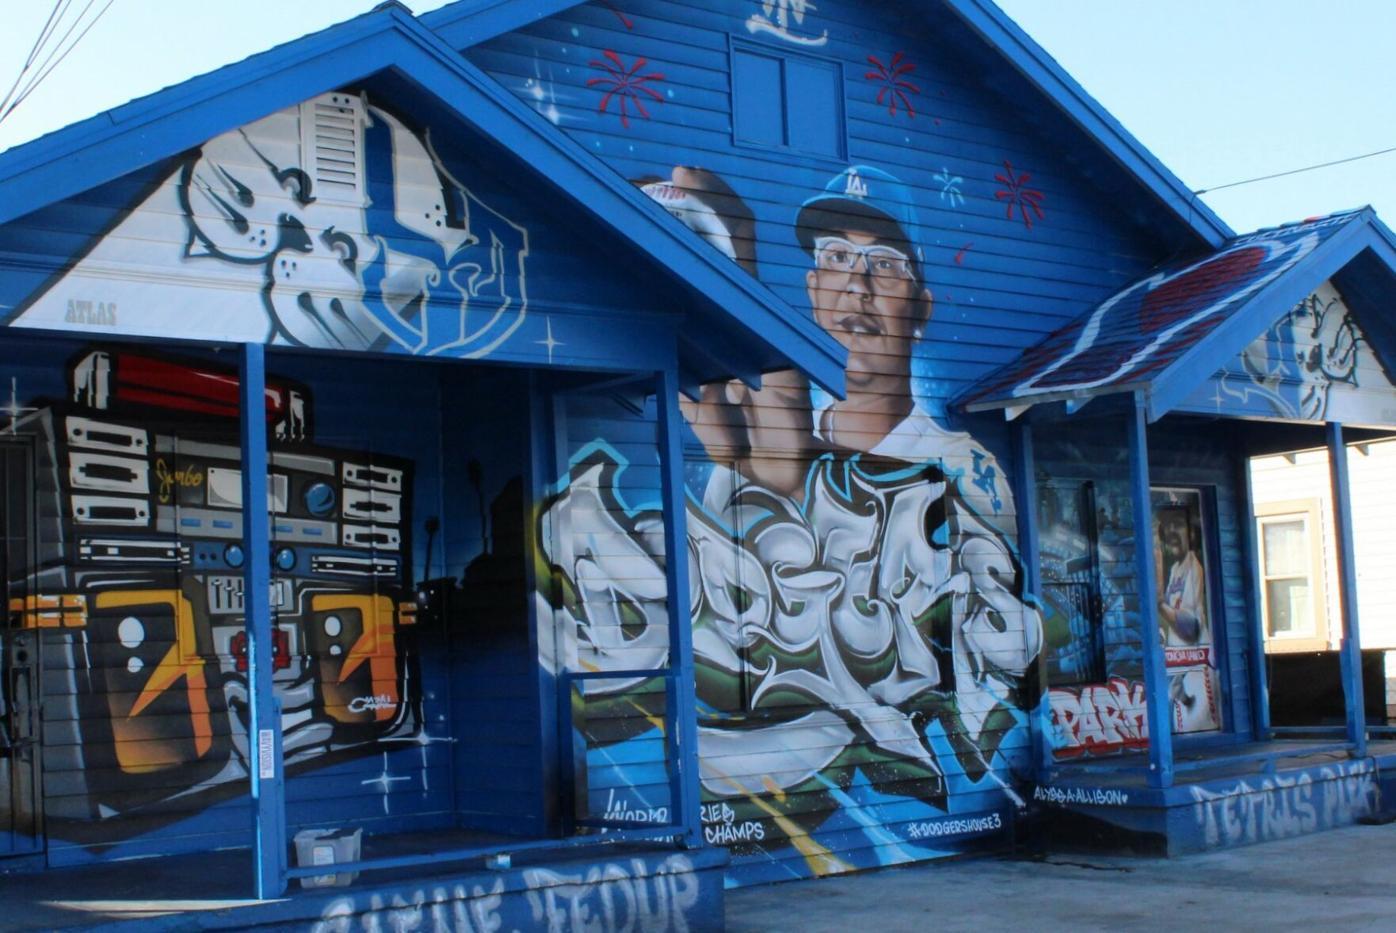 East LA Dodgers House.